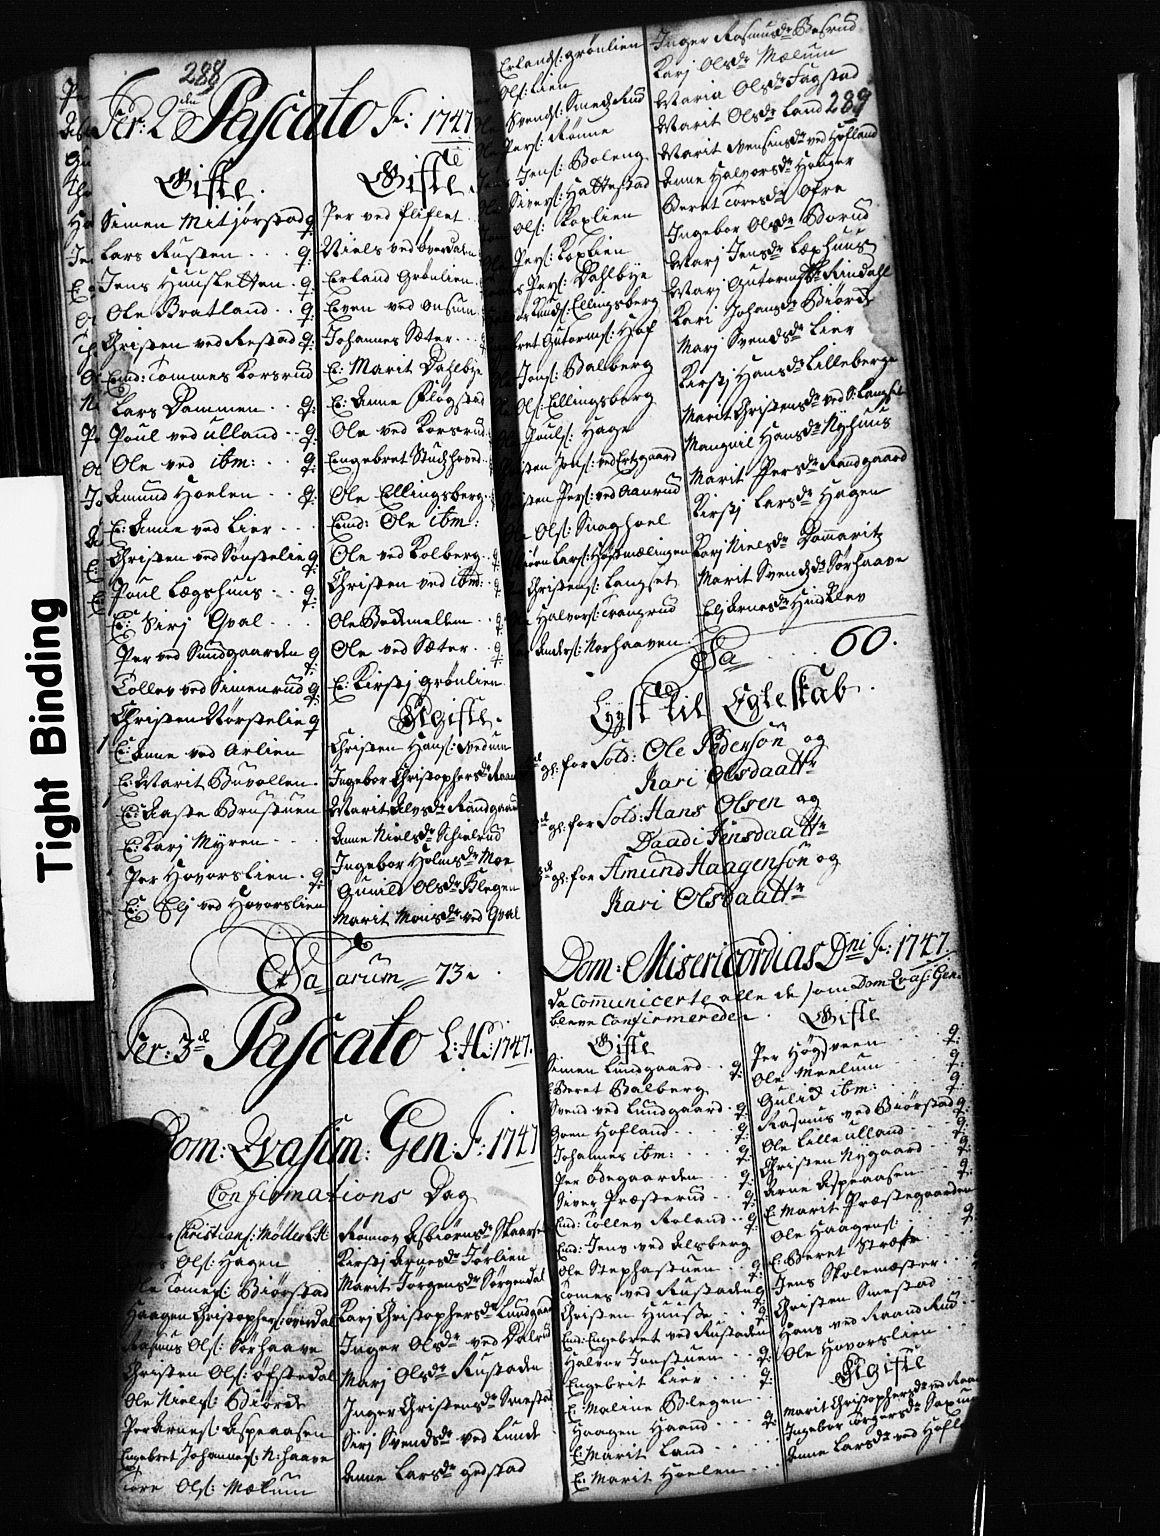 SAH, Fåberg prestekontor, Klokkerbok nr. 2, 1741-1756, s. 288-289